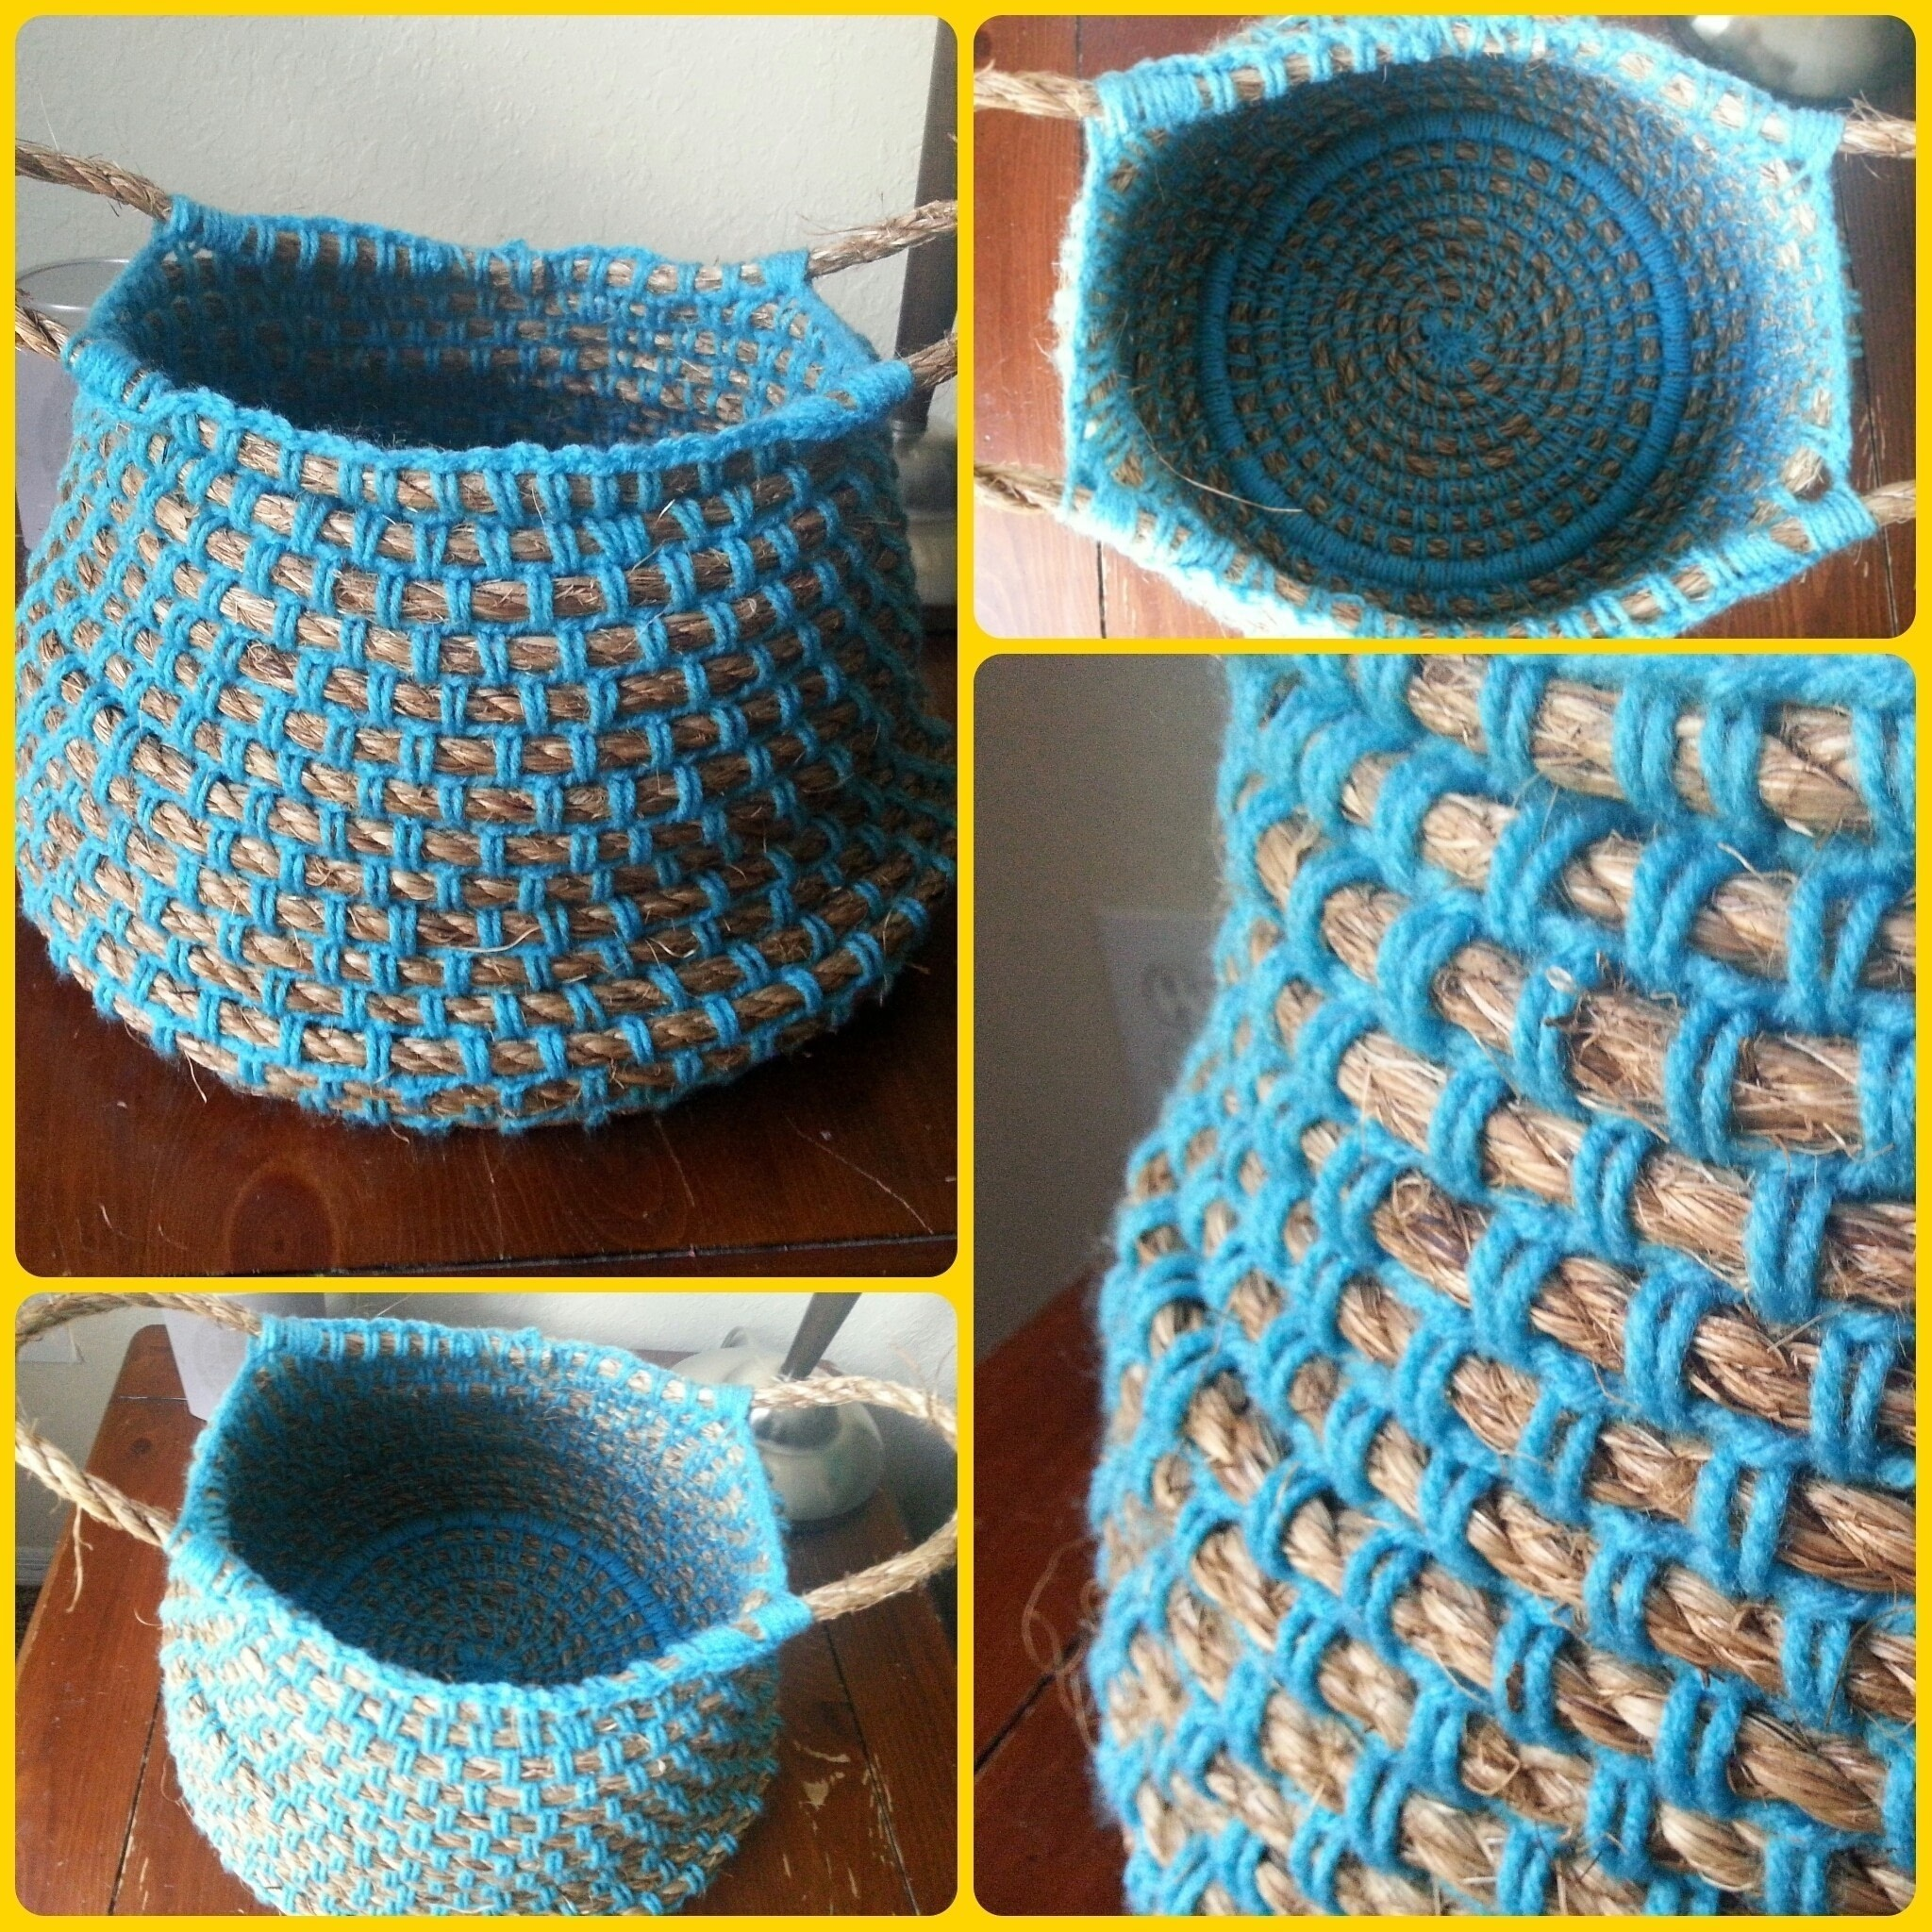 Crochet Rope Basket · A Knit Or Crochet Basket · Home